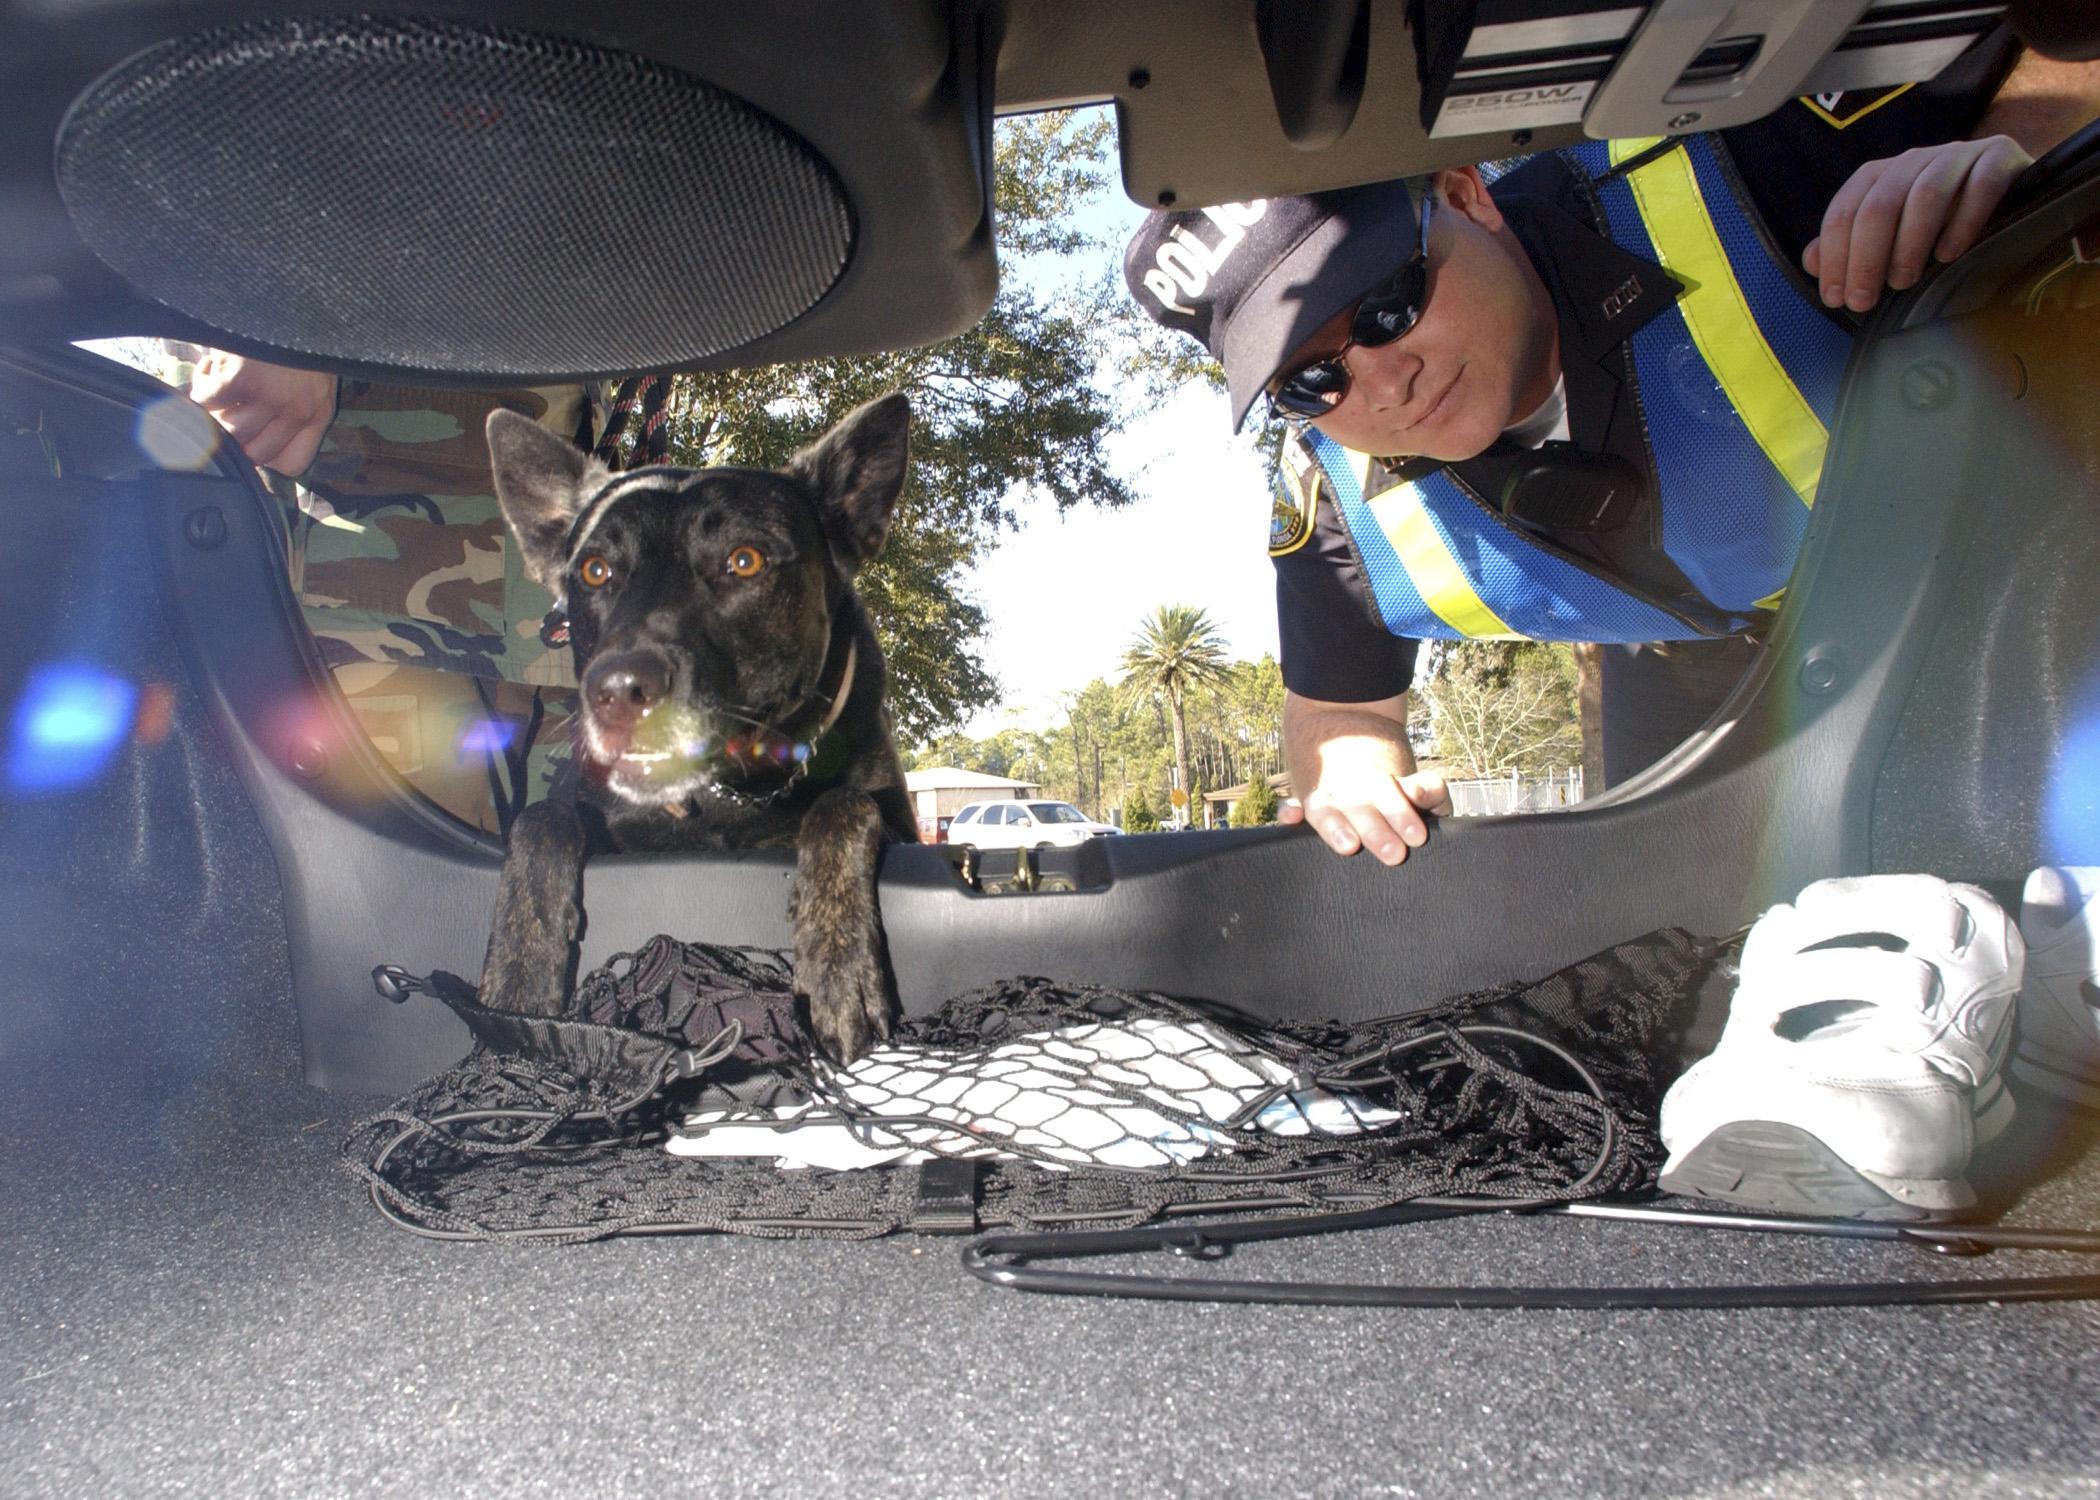 Under vehicle inspection - Wikipedia